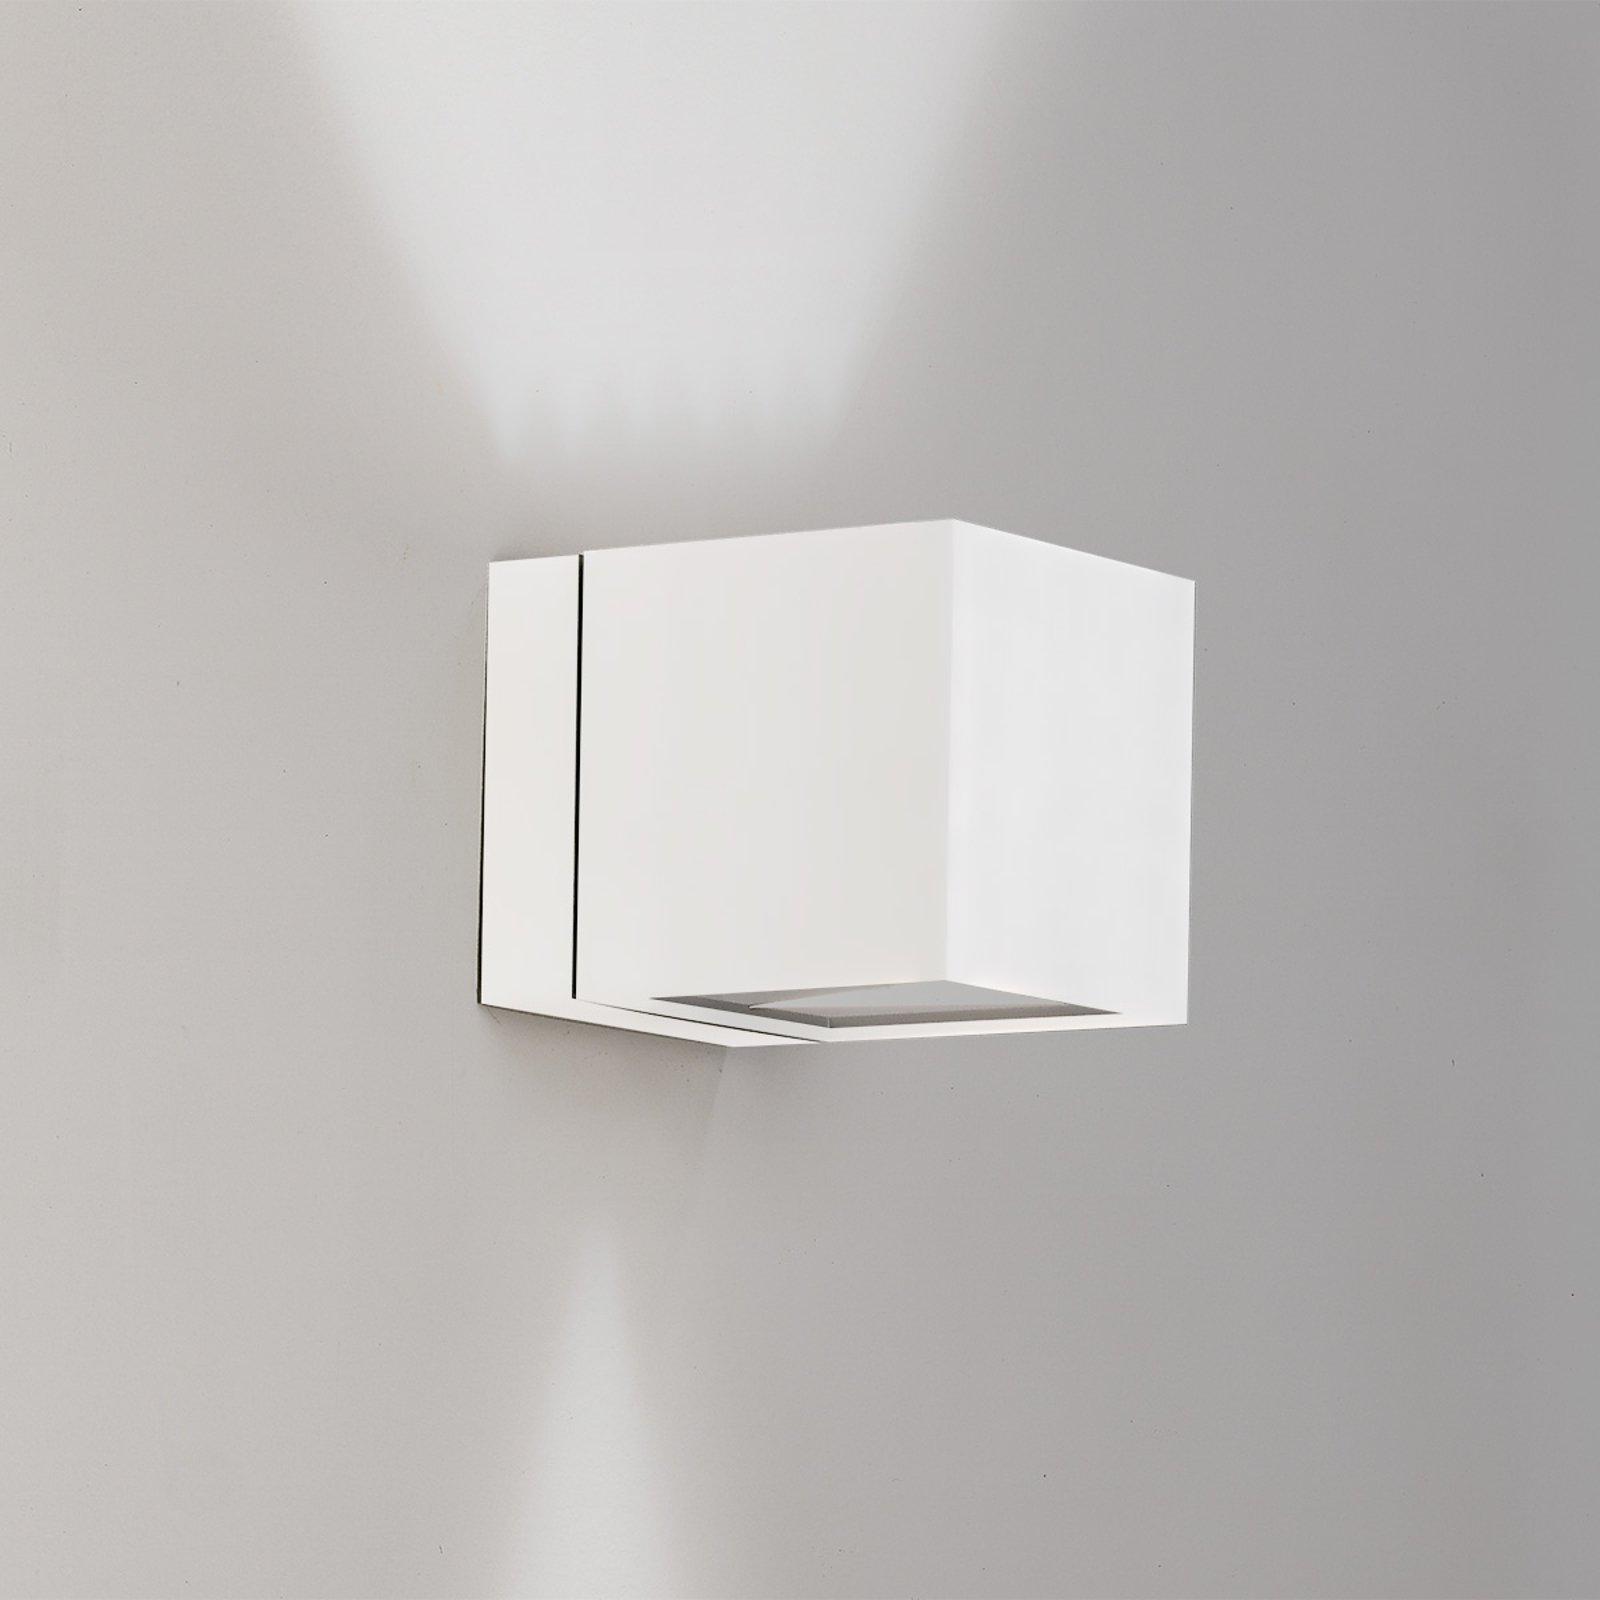 Vegglampe Dau med terningform up-og downlight hvit